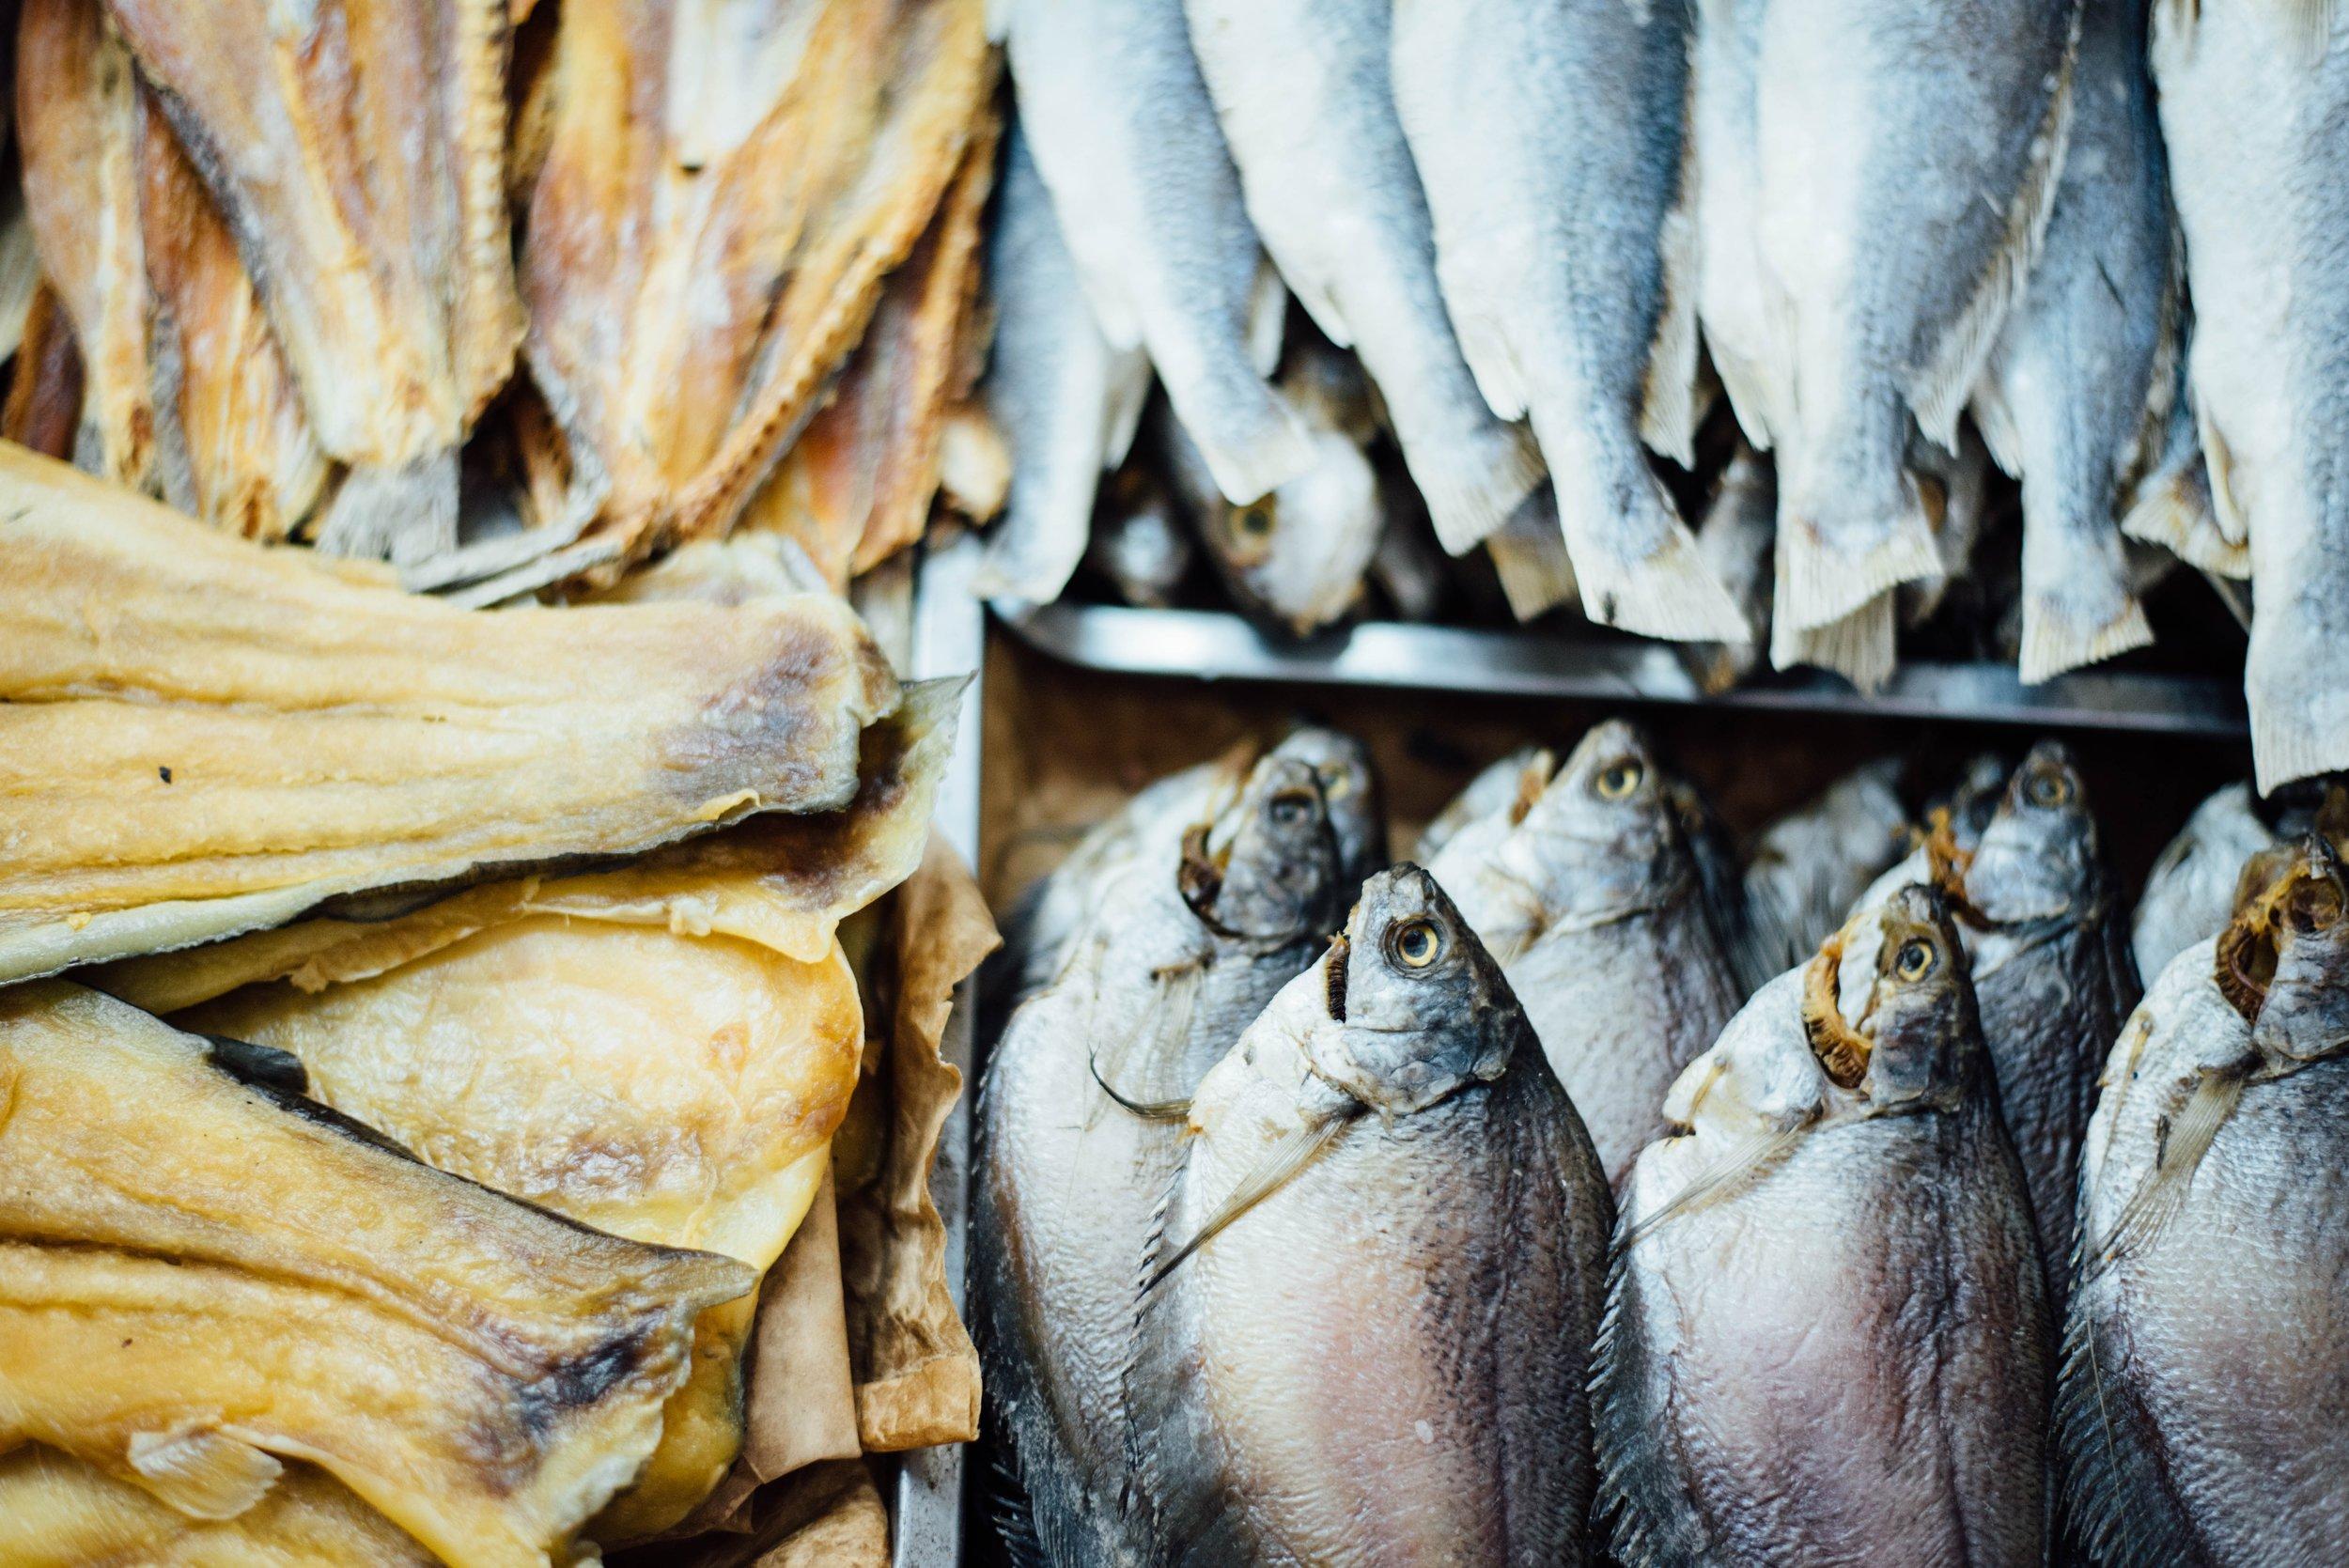 180720 FISH.jpg